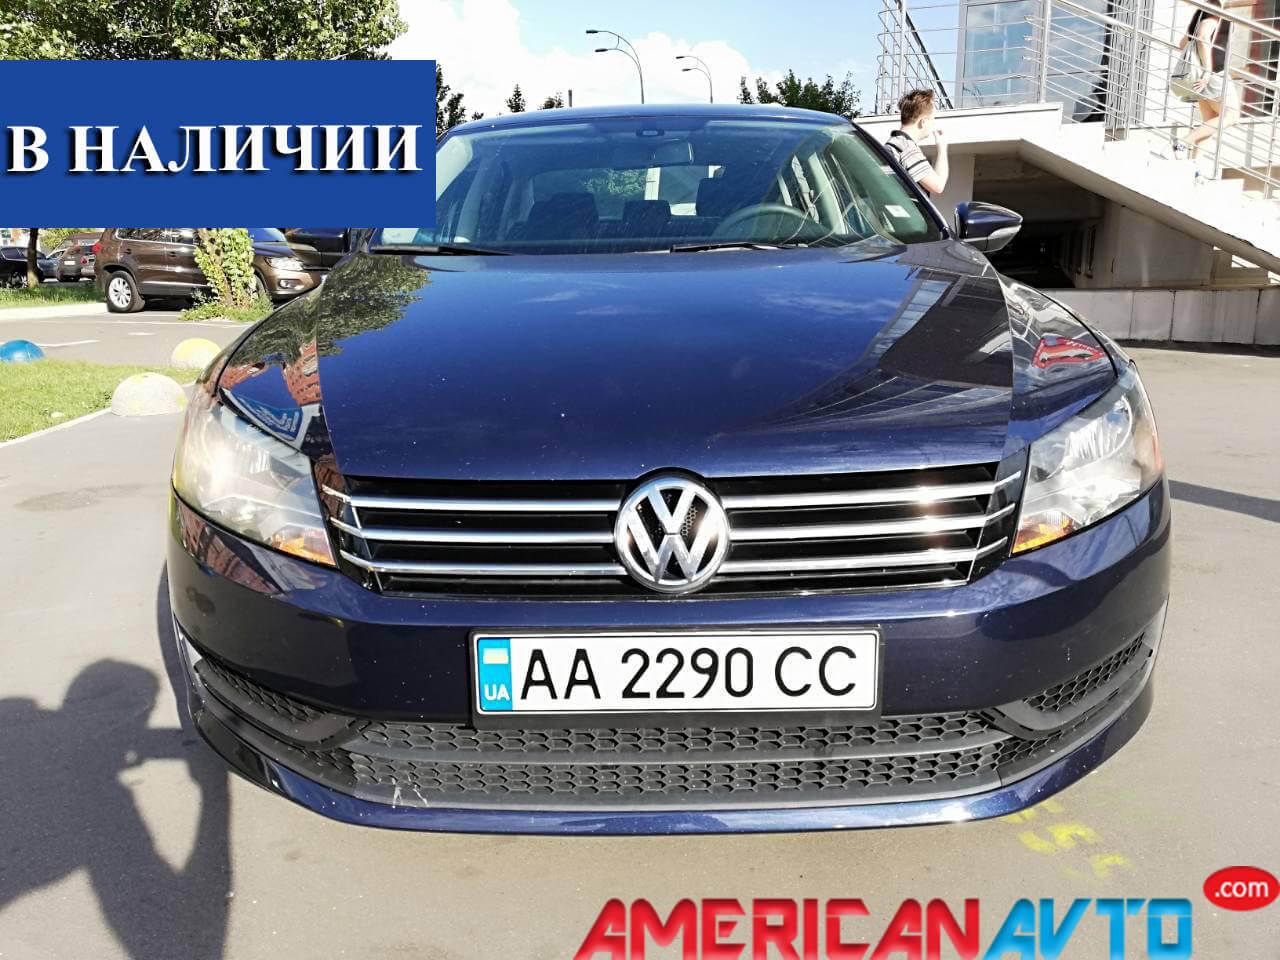 Volkswagen Passat в наличии в Украине